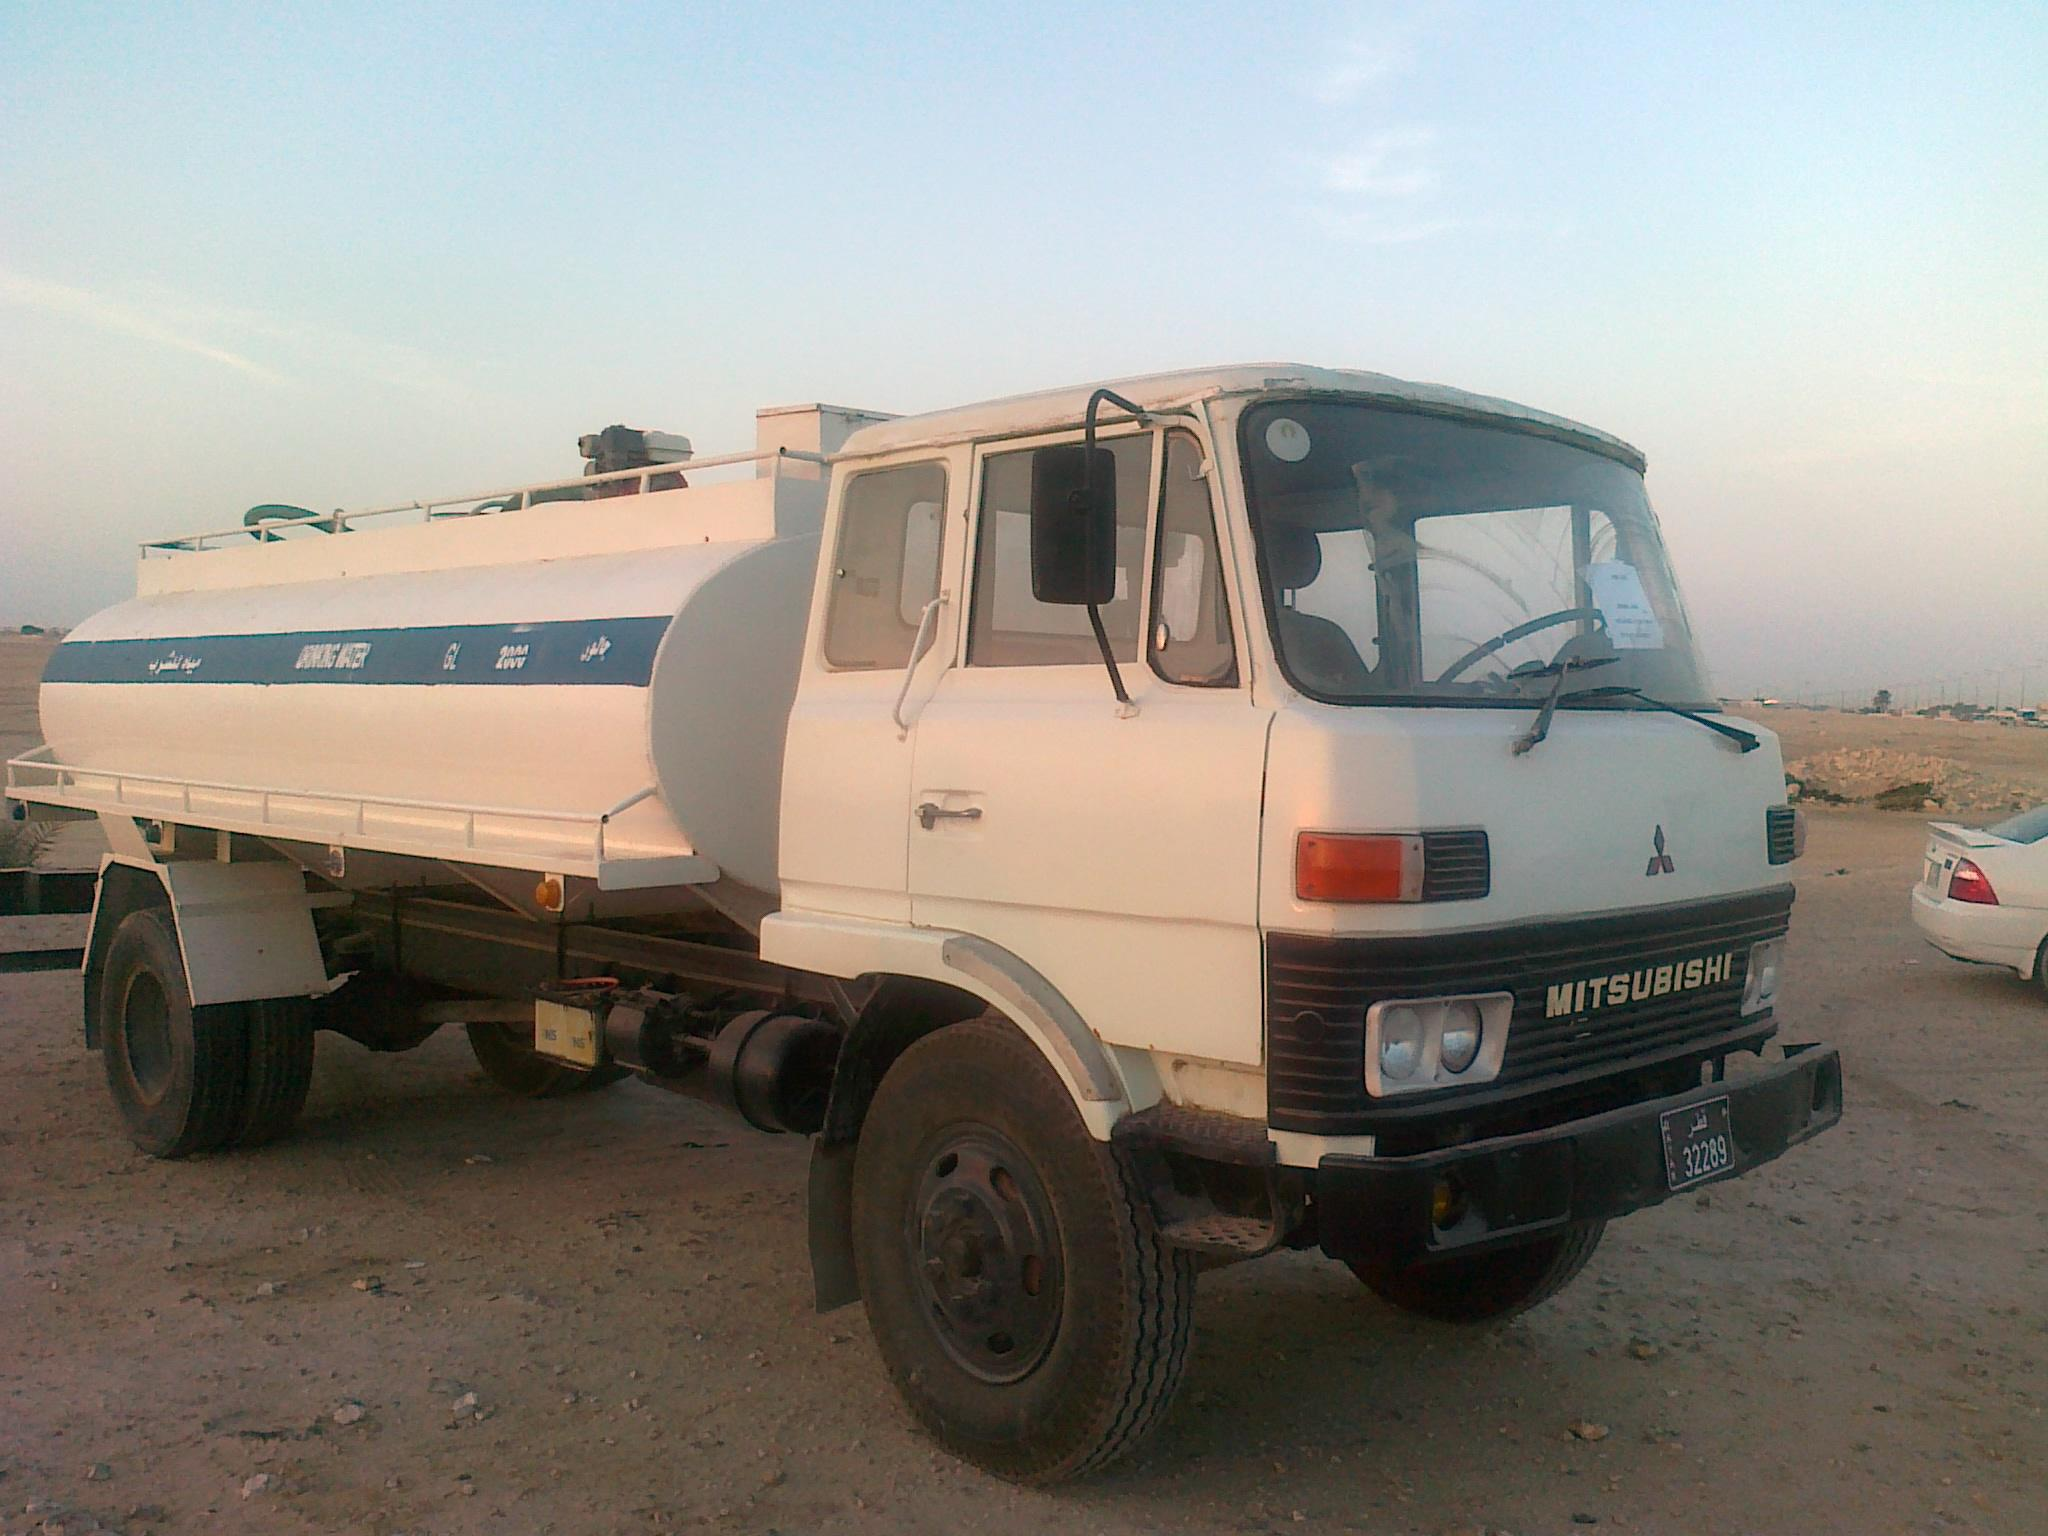 SWEET WATER SUPPLY IN QATAR(Sewage Removal & Dust bin ) | Qatar Living